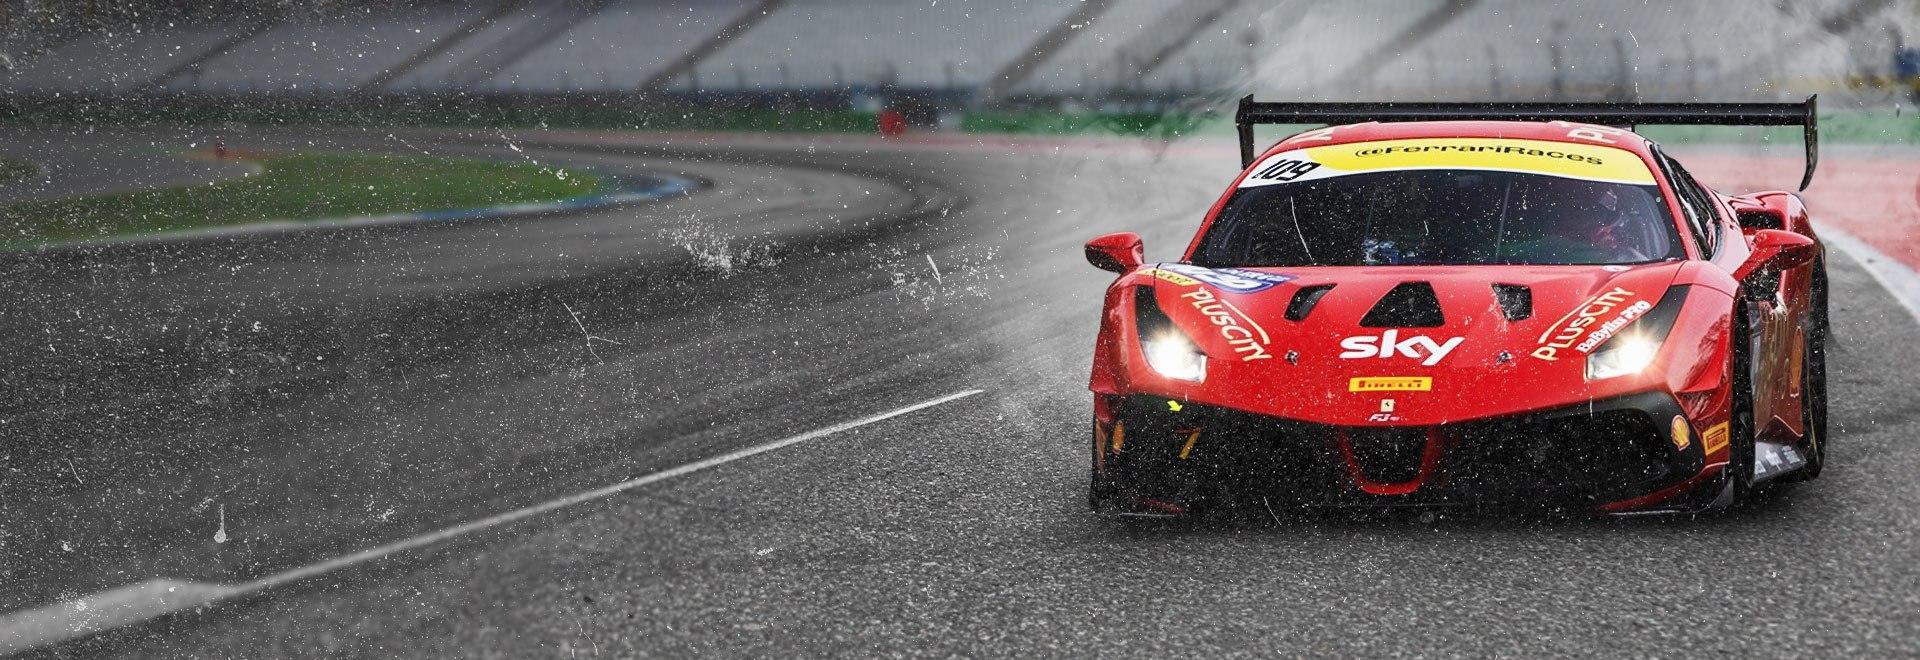 Trofeo Pirelli Nurburgring